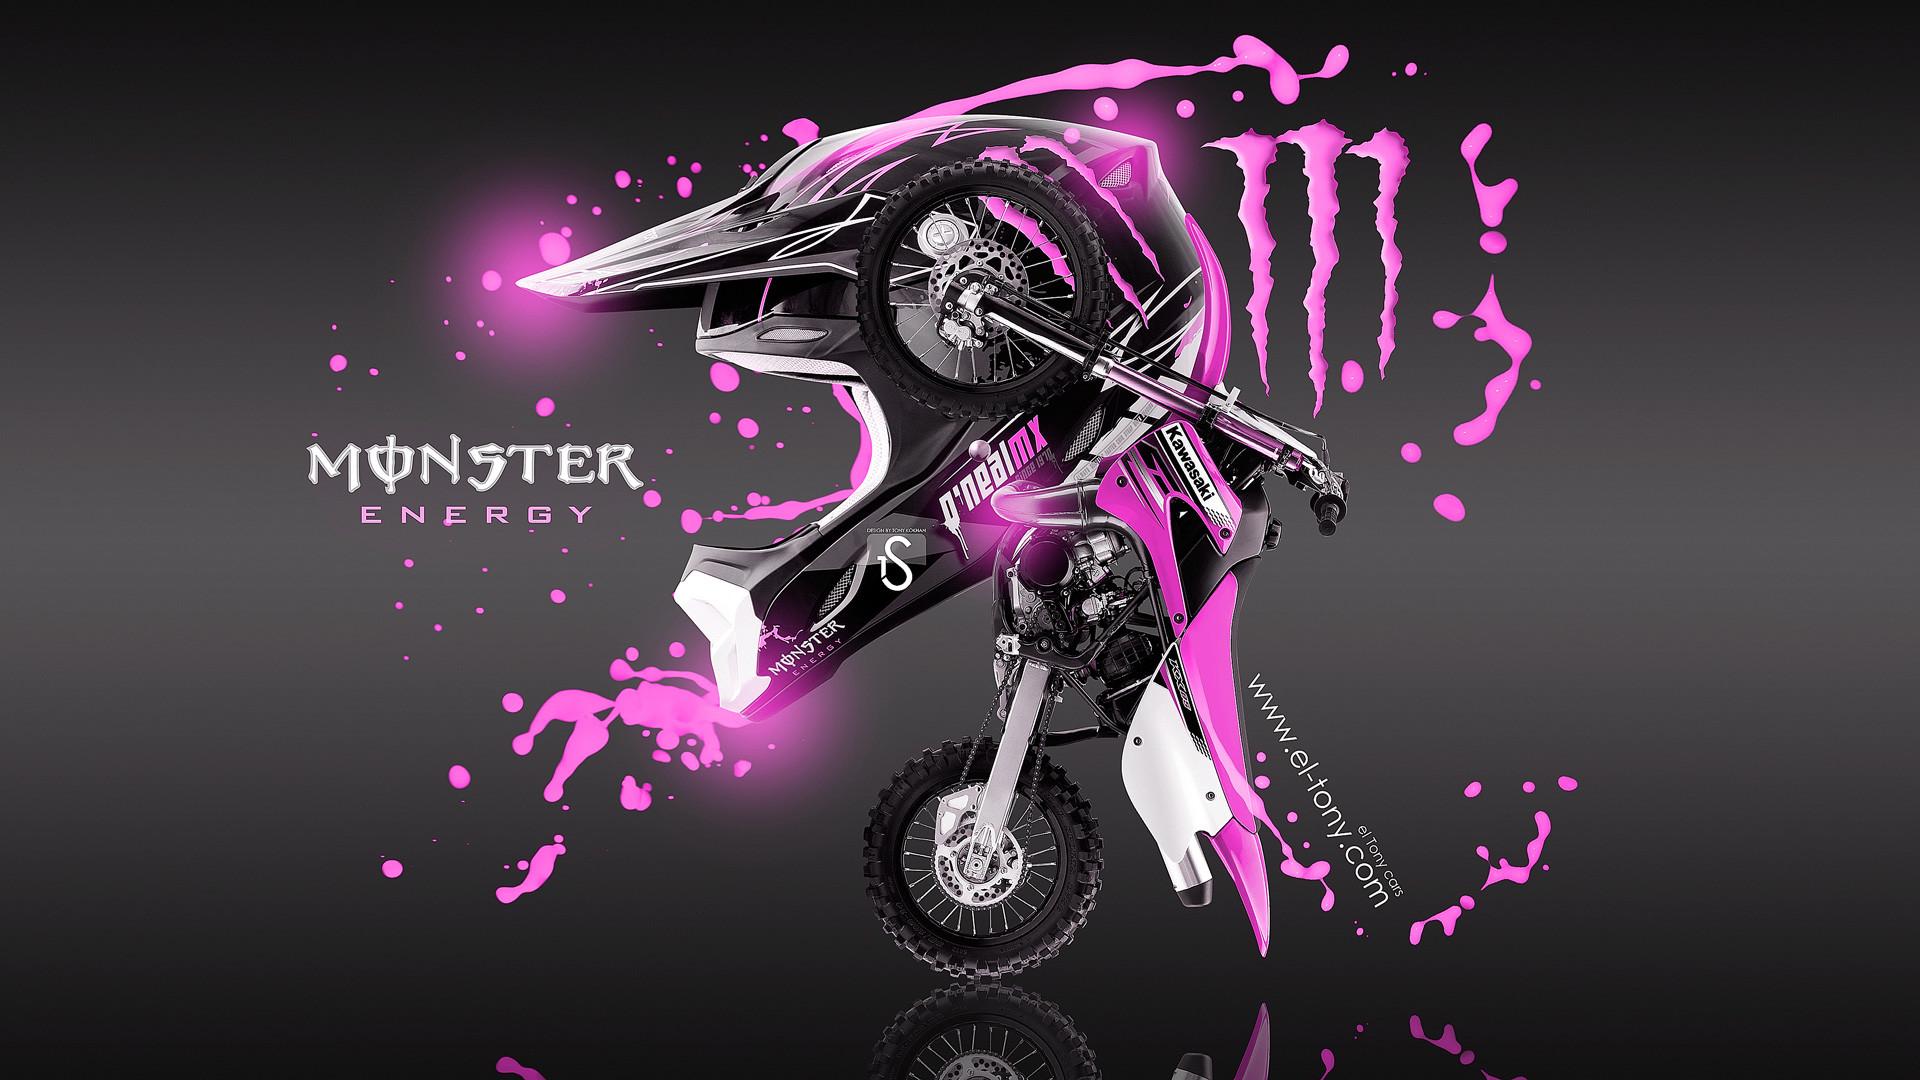 Desktop Monster Energy HD Wallpaper Free Download 2794x1821